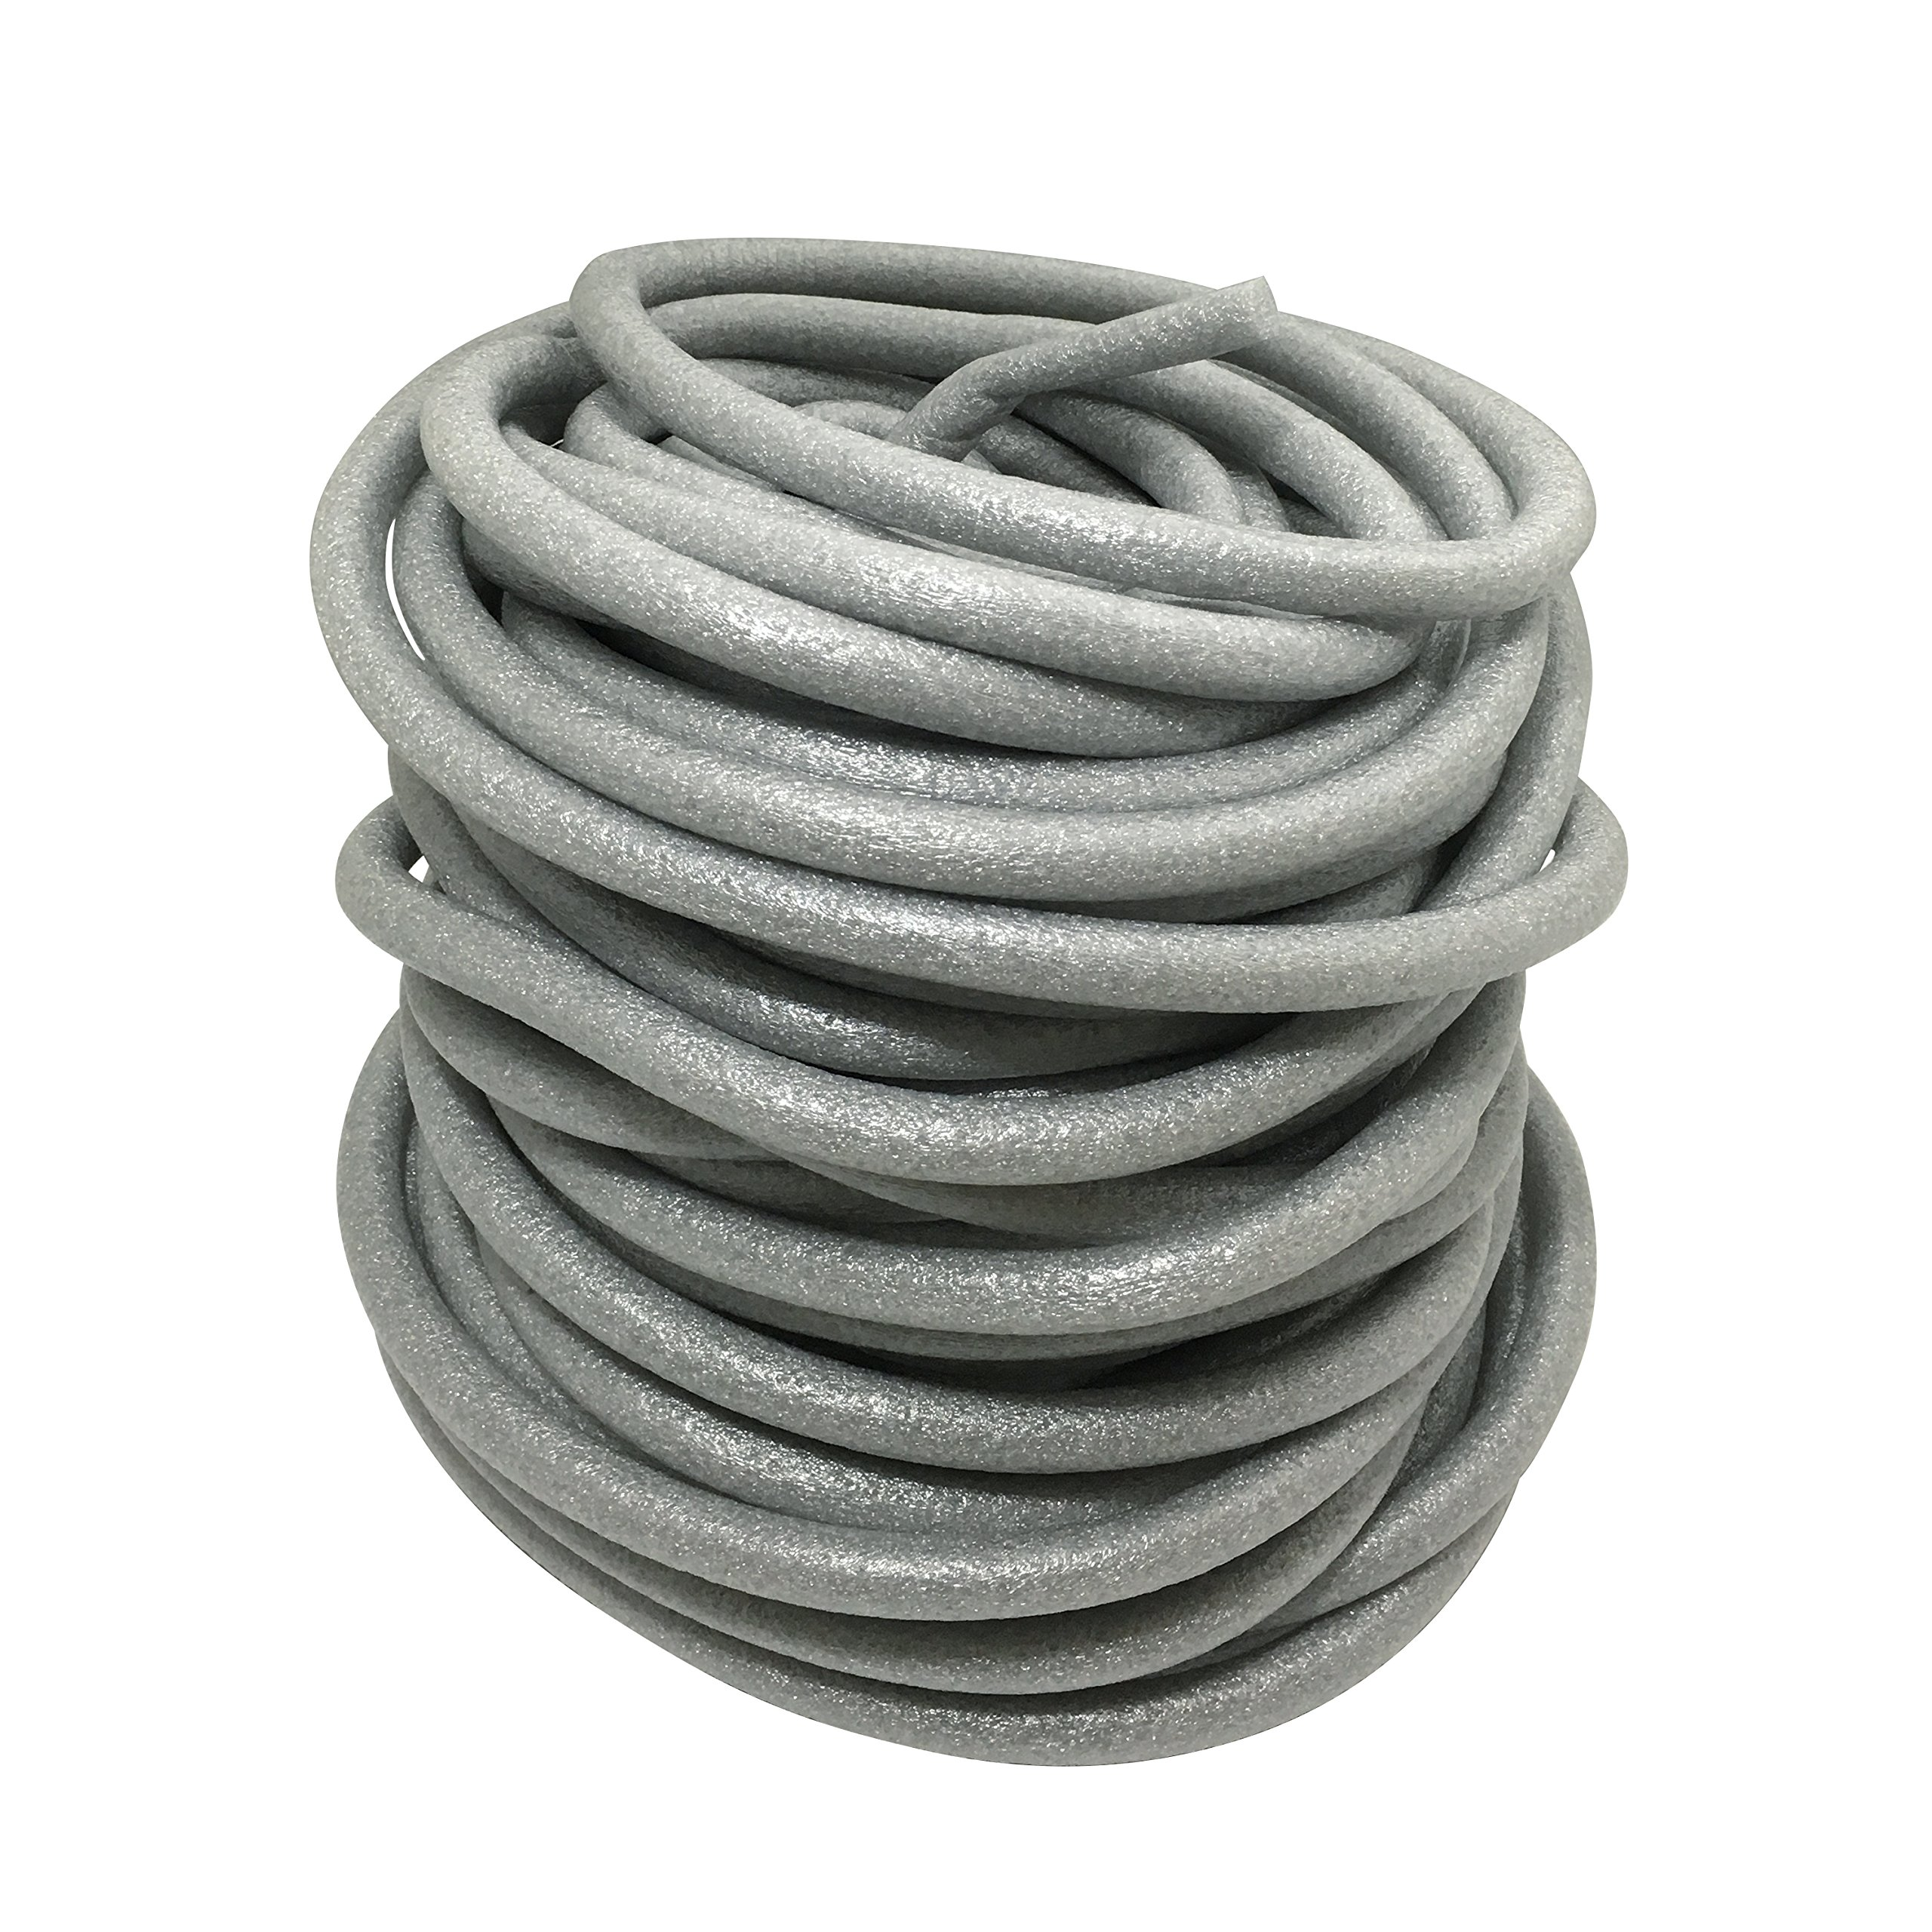 Frost King C23CP Caulk Saver Bulk Contractor Pack, 5/8 inch Diameter x 150' Long,,, Grey